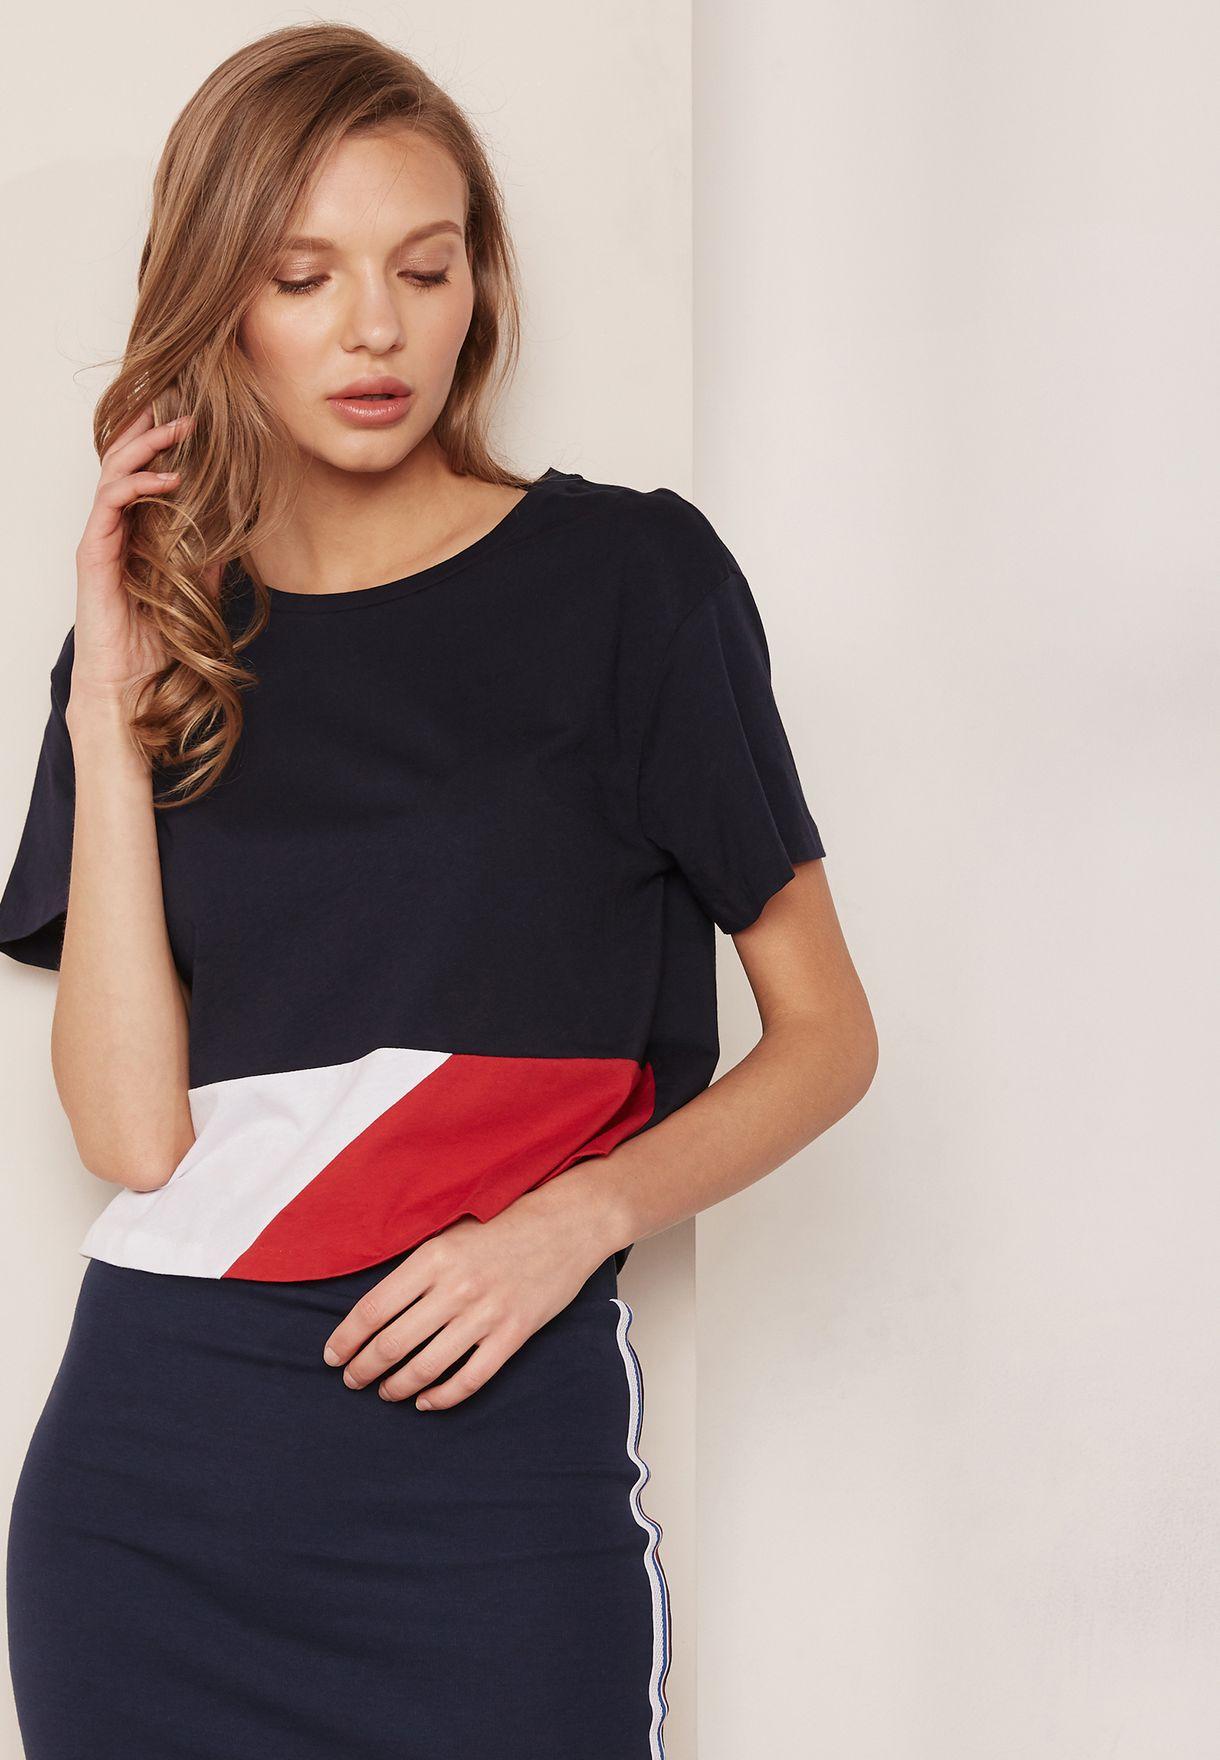 cb6844db1def1 Shop Tommy Hilfiger navy Colourblock Crop Top WW0WW21994 for Women in Qatar  - TO279AT57LSS